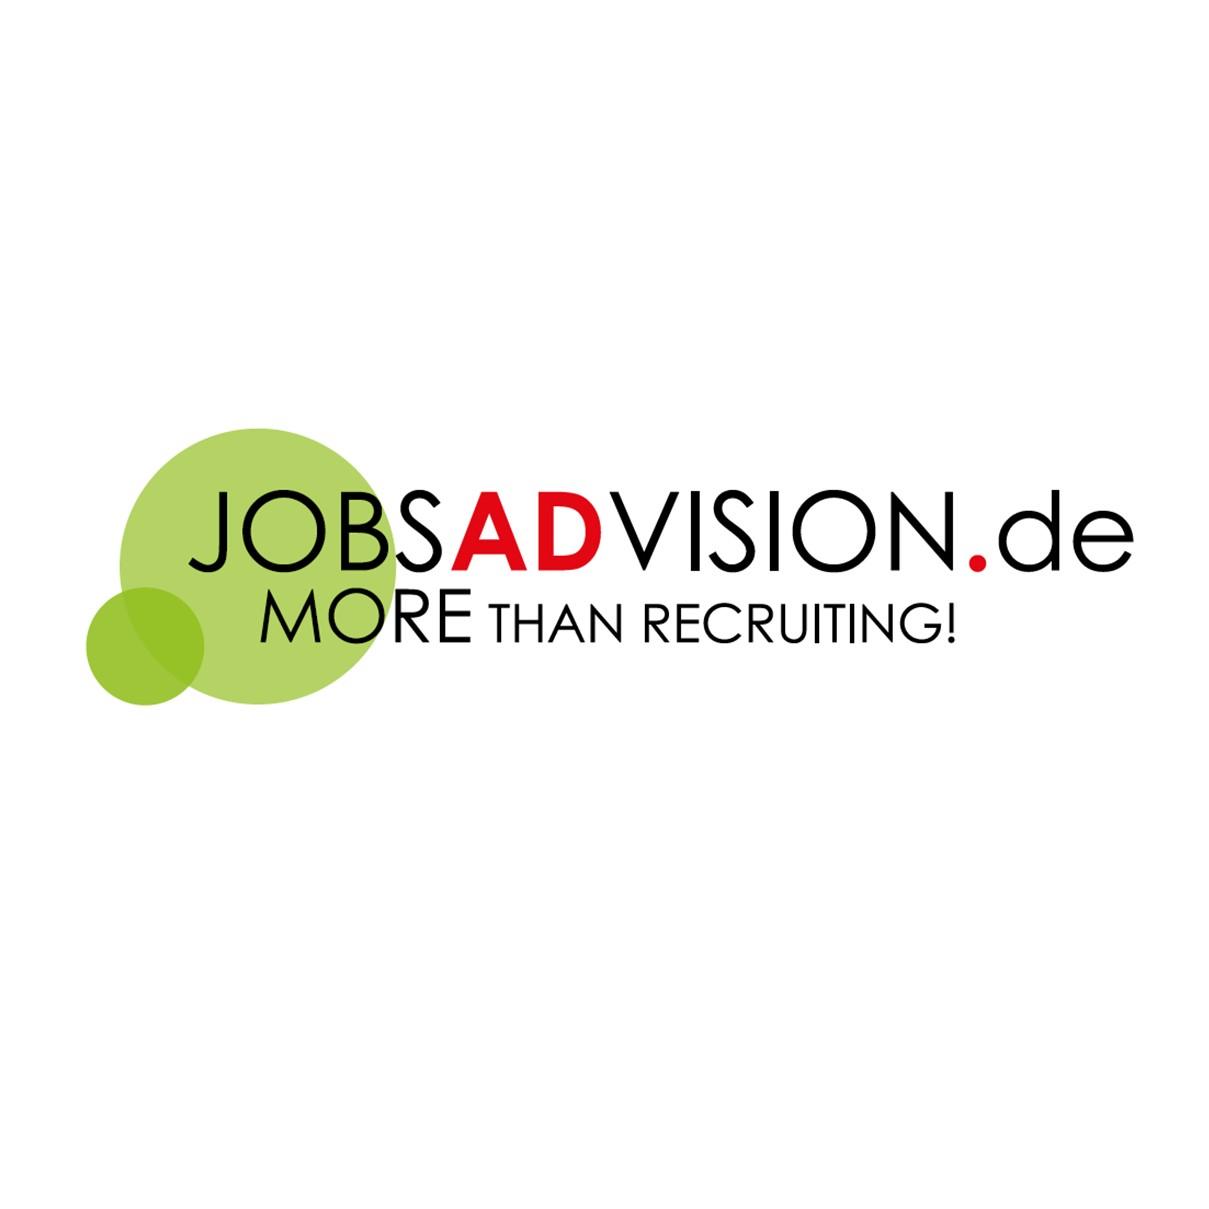 Job Advision